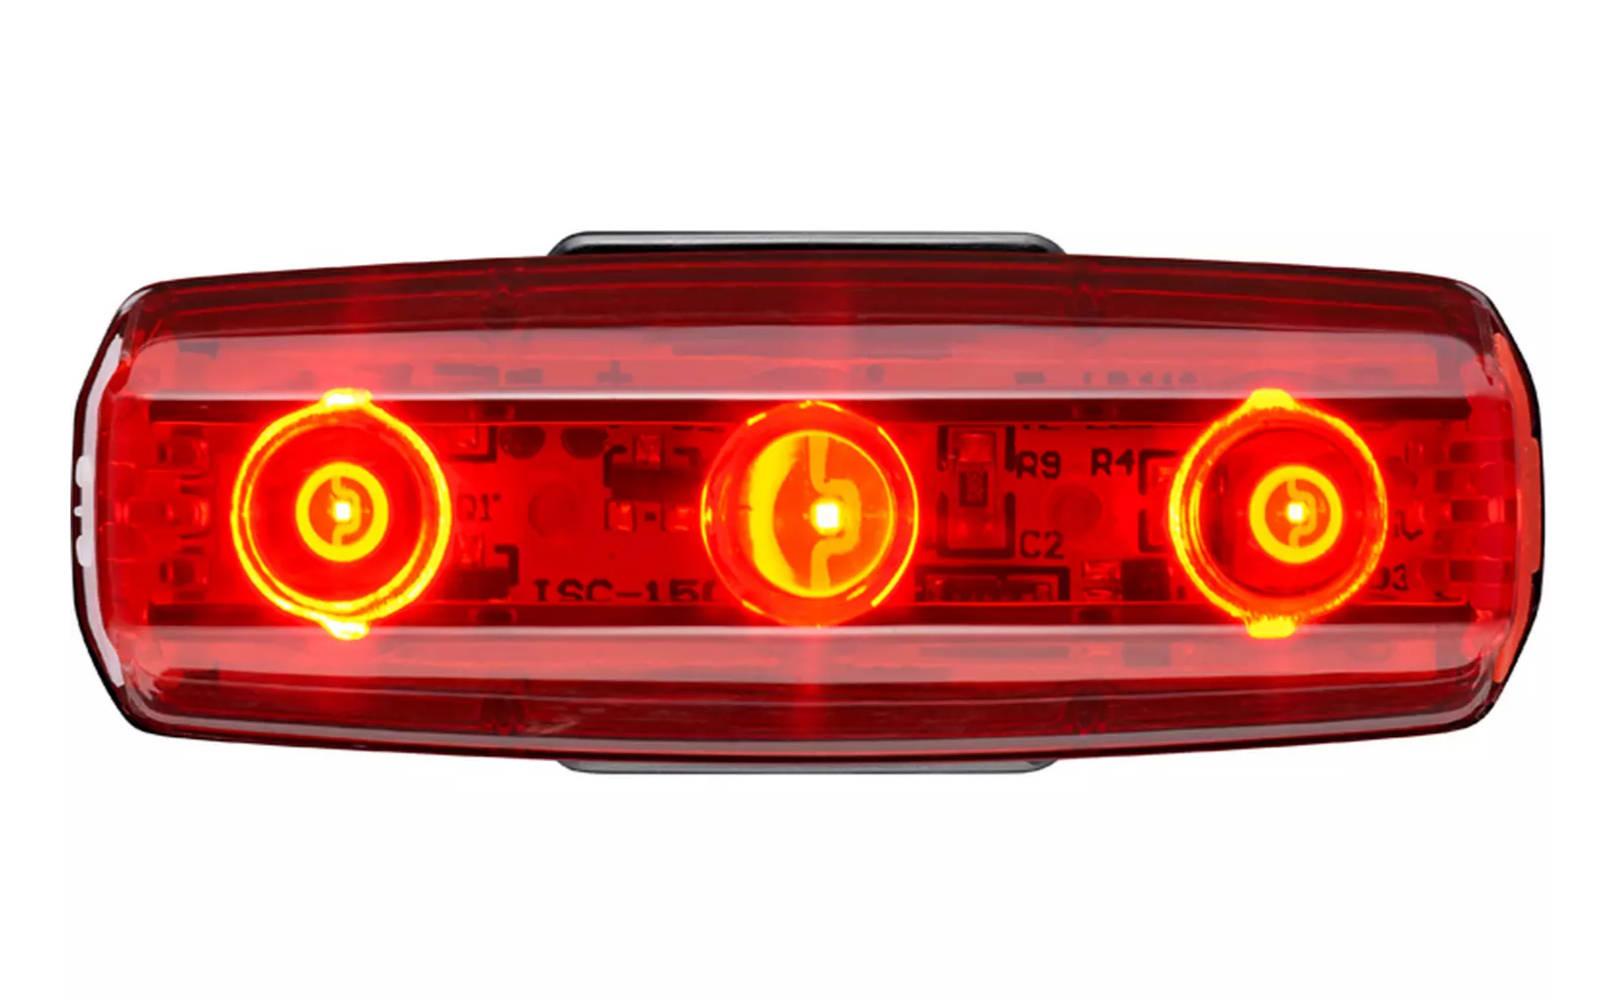 Cateye Rapid Micro Rechargeable Rear Light